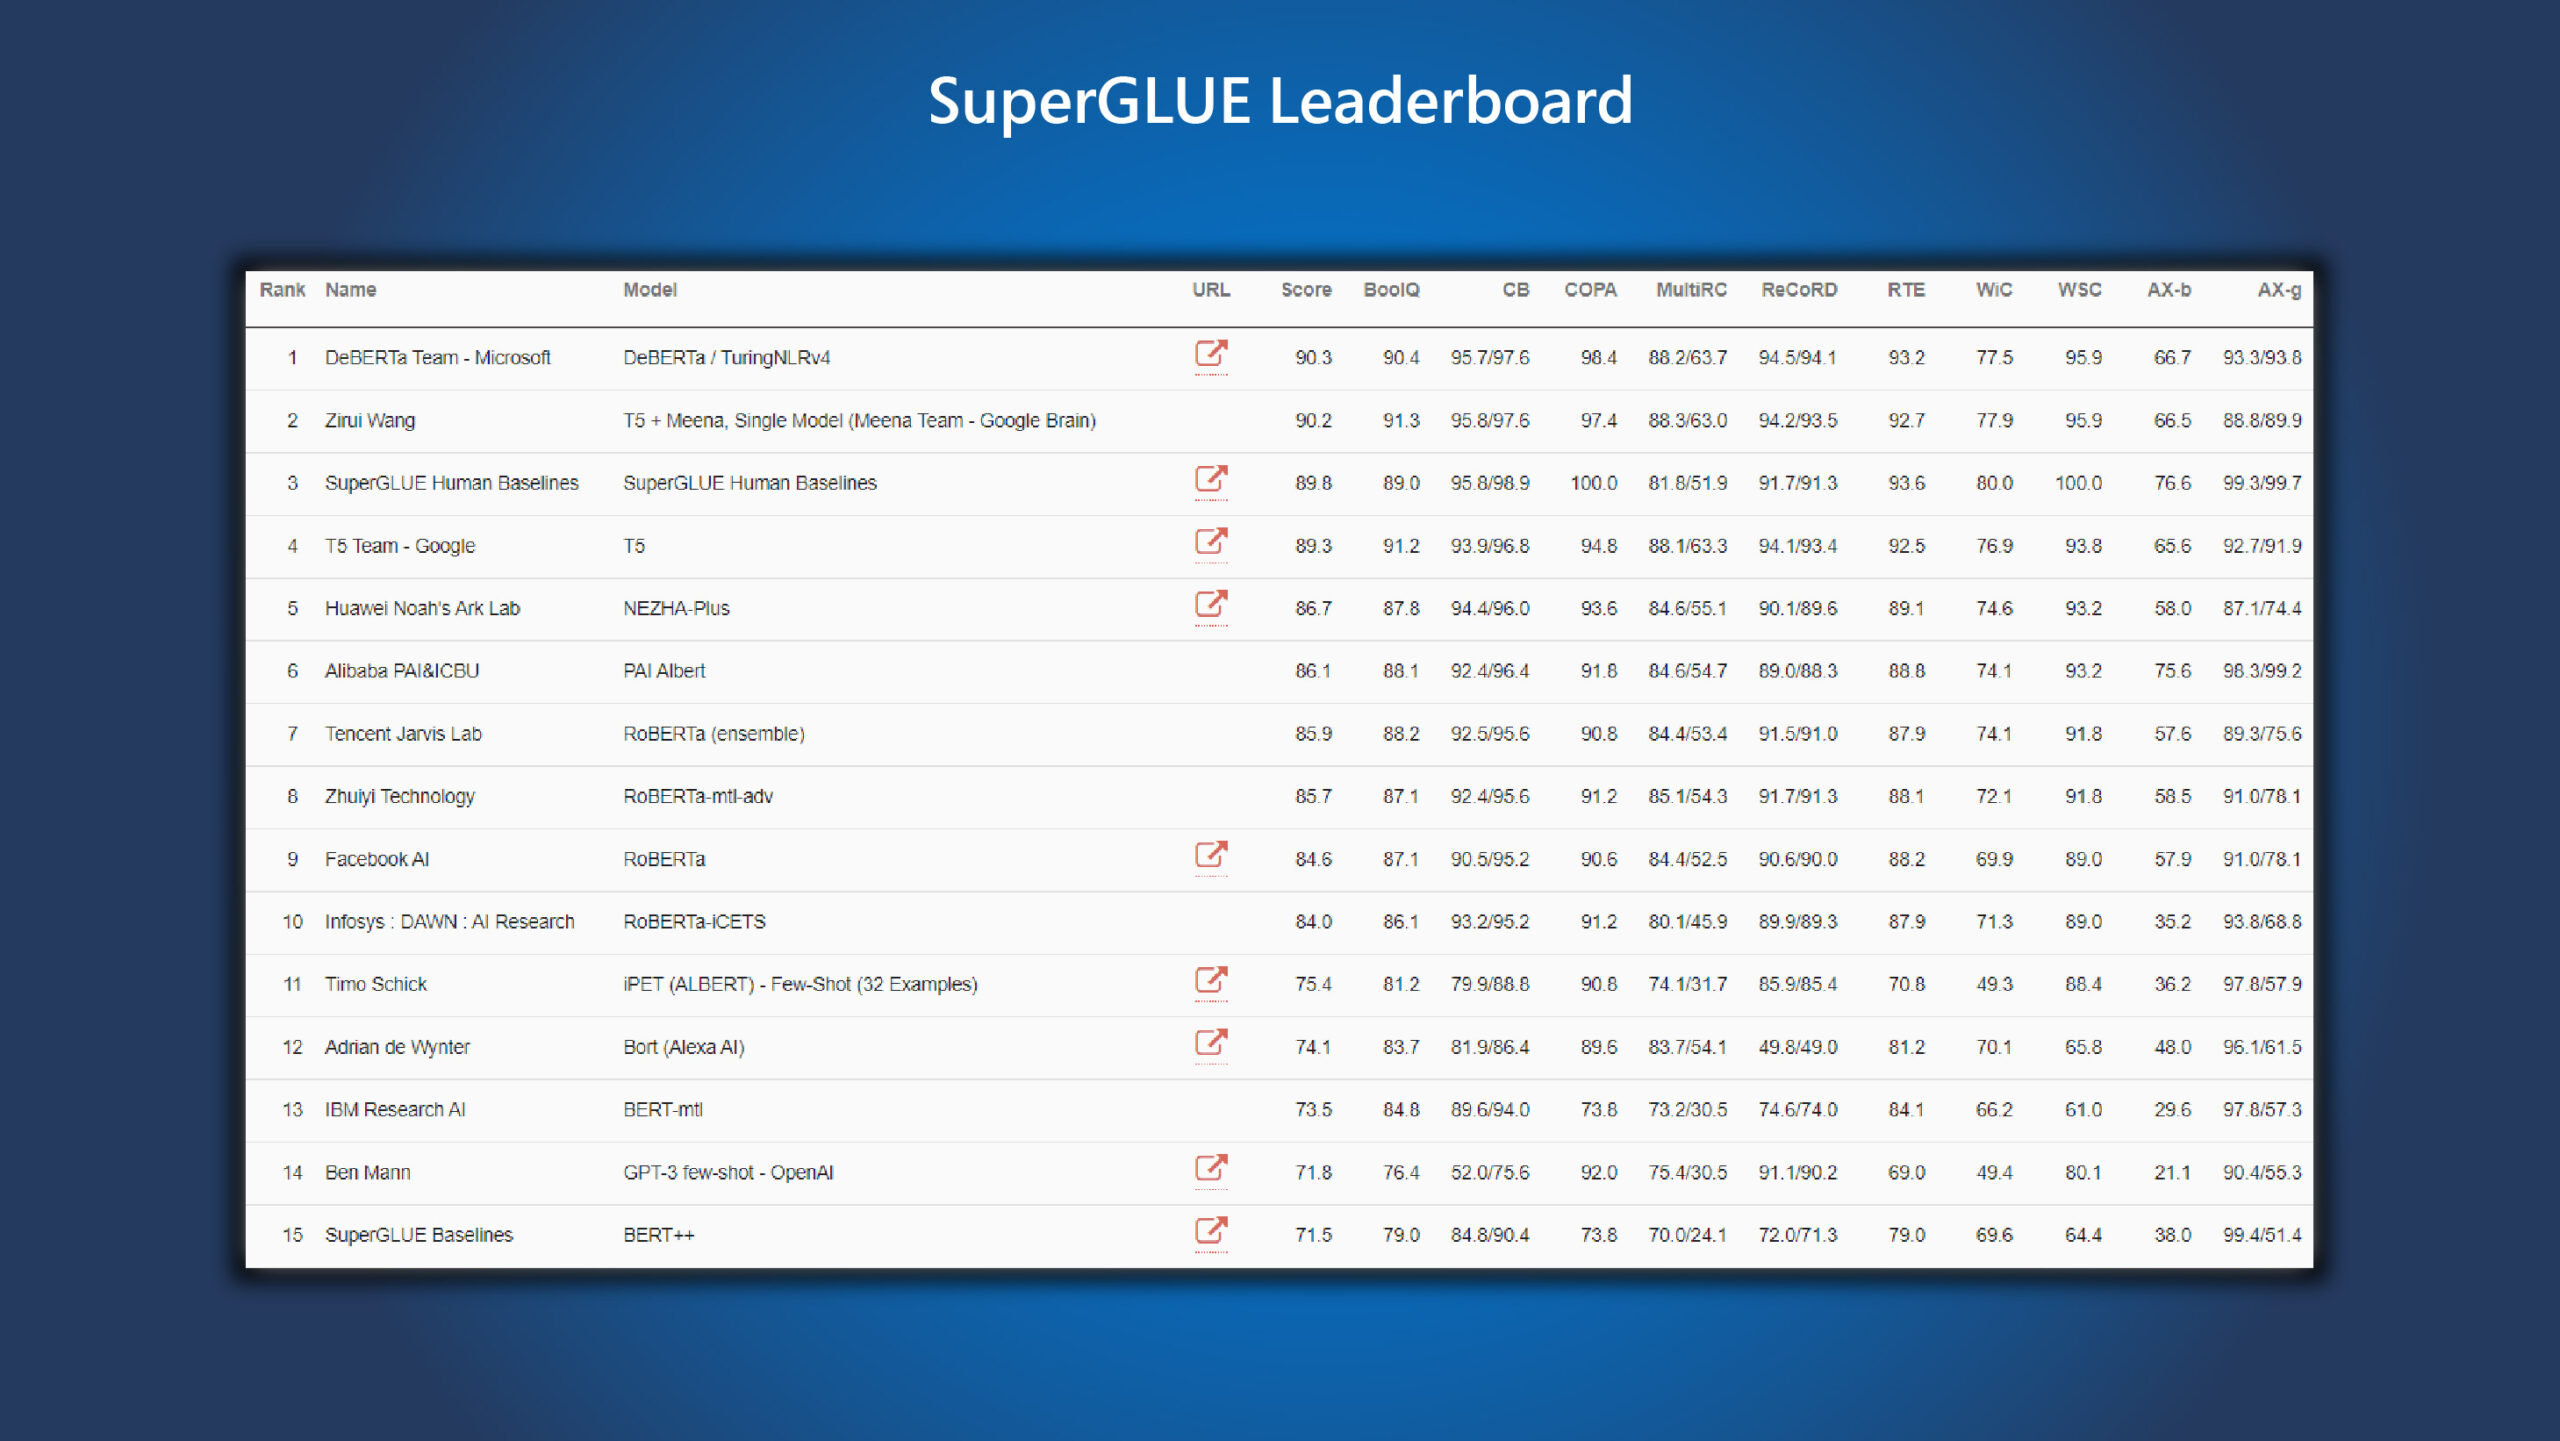 Microsoft DeBERTa surpasses human performance on the SuperGLUE benchmark